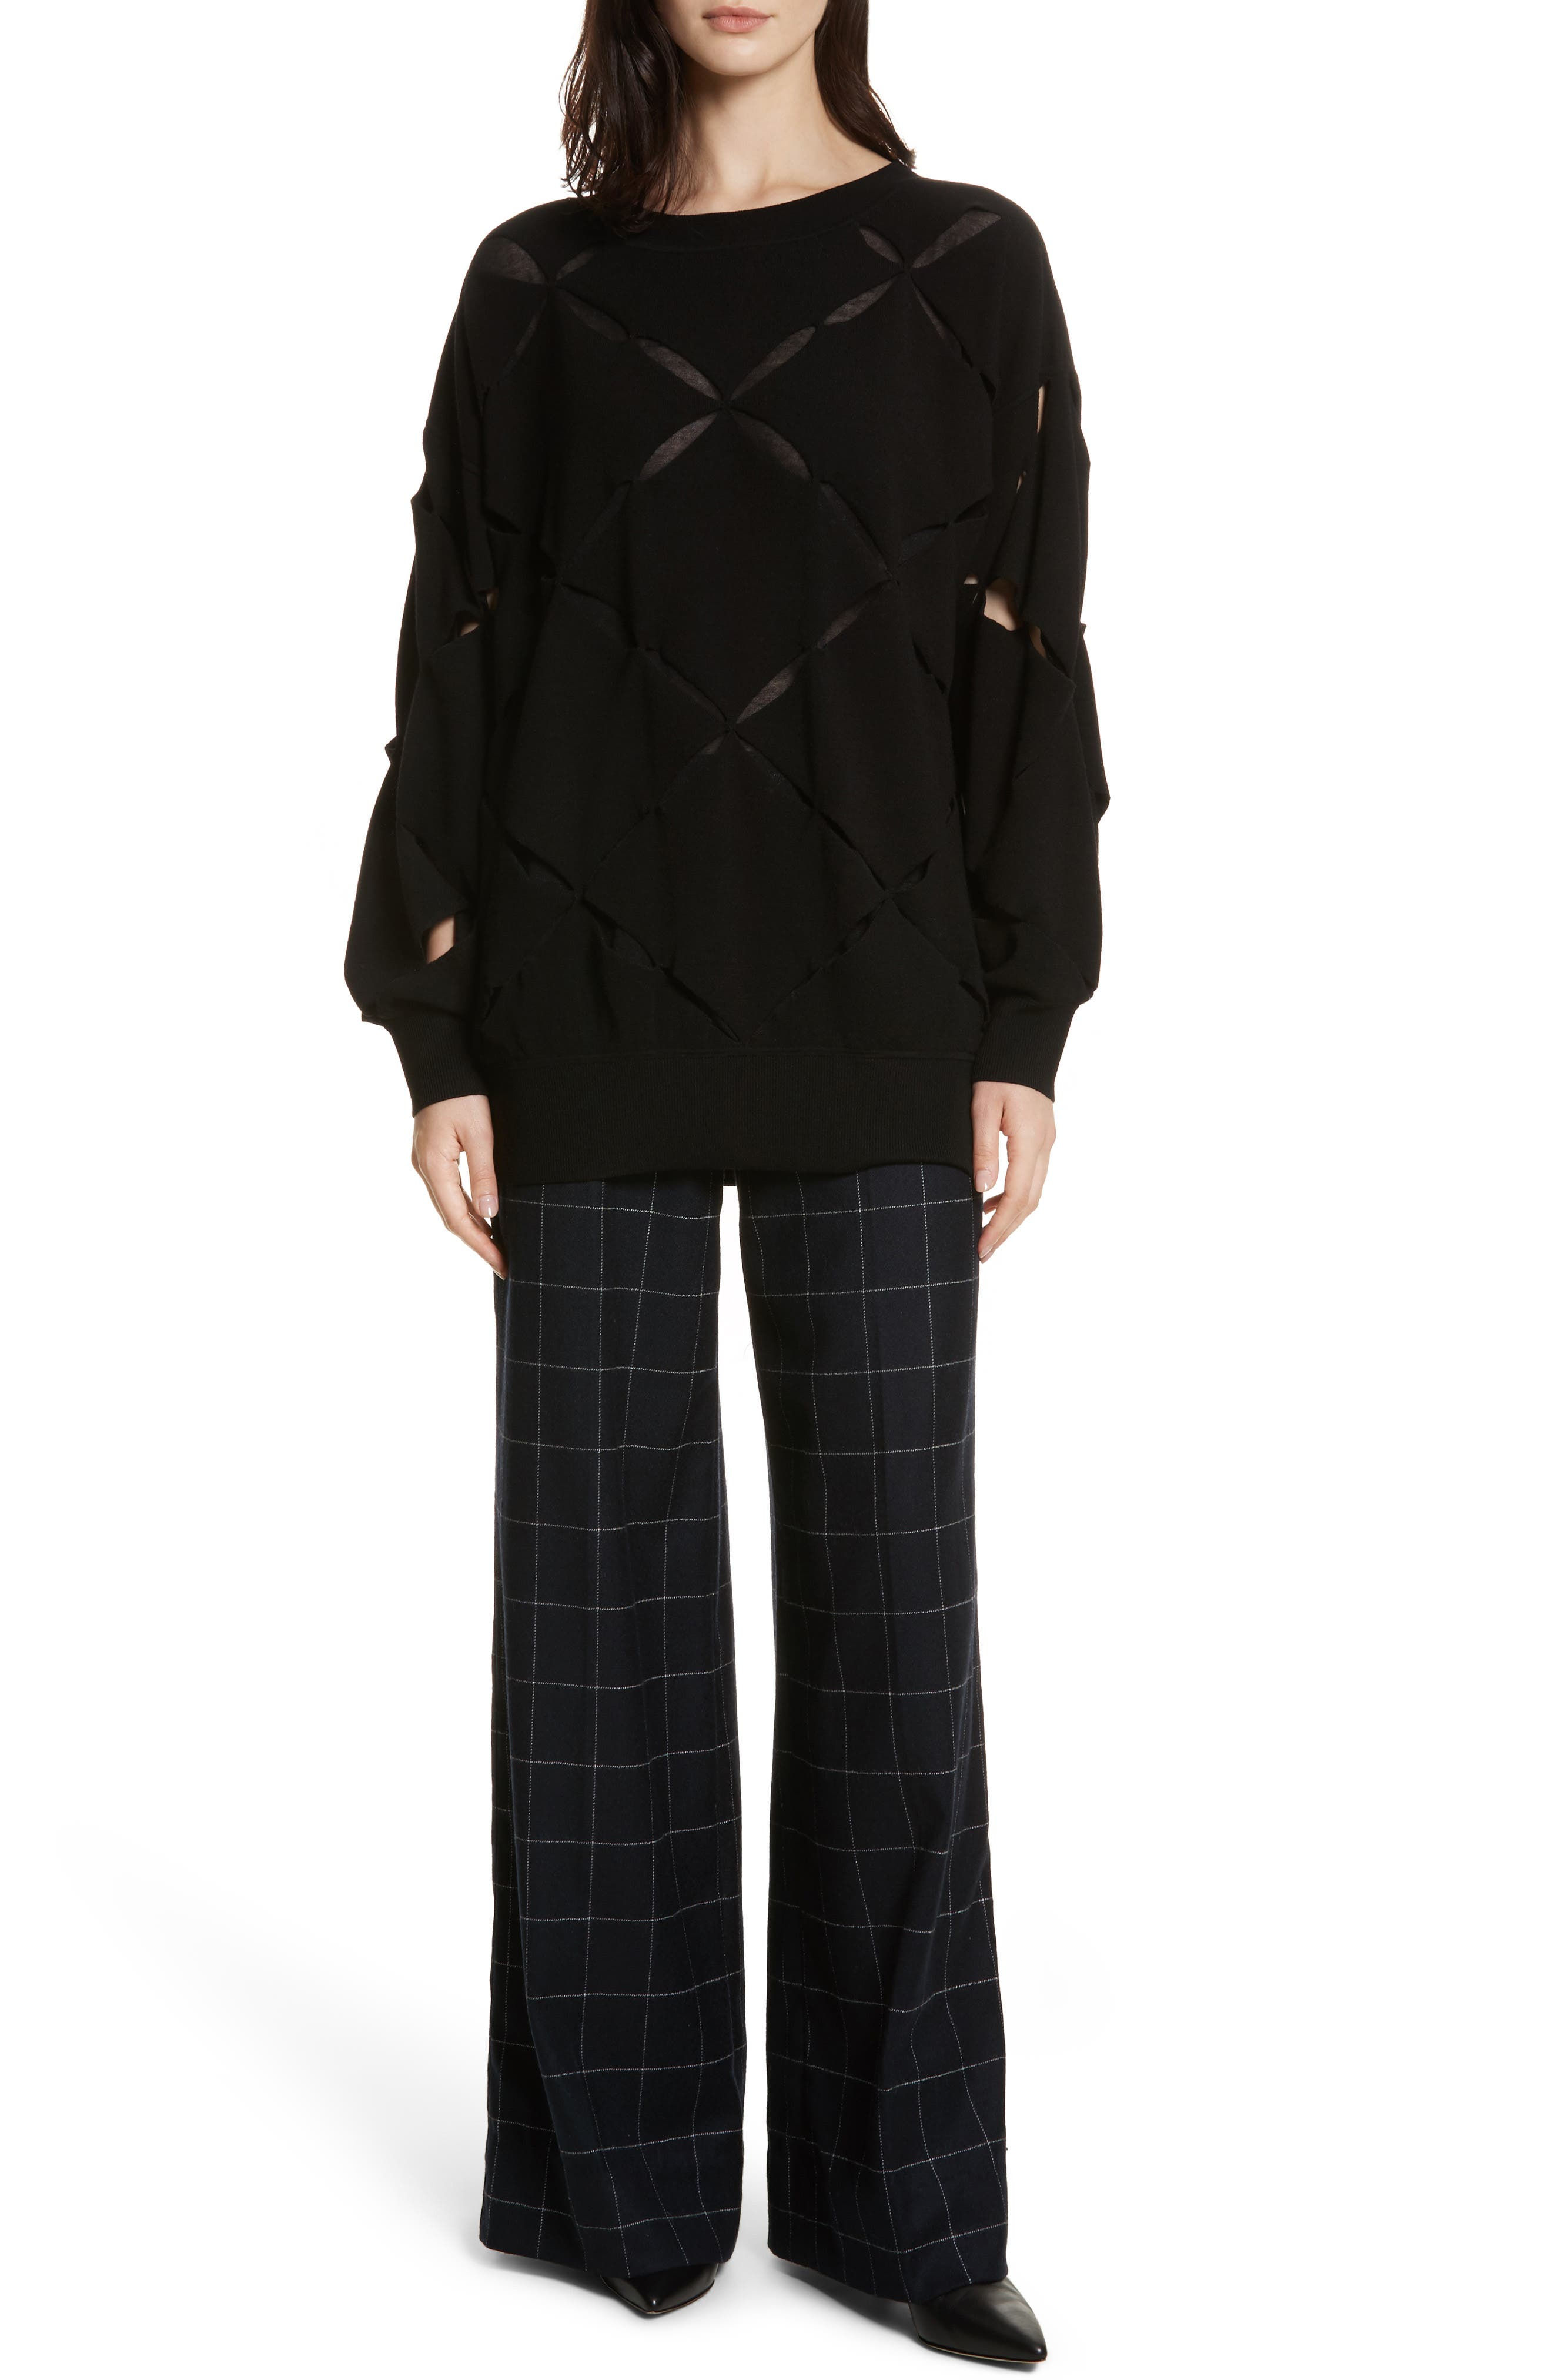 Roz Cutout Sweater,                             Alternate thumbnail 7, color,                             Black